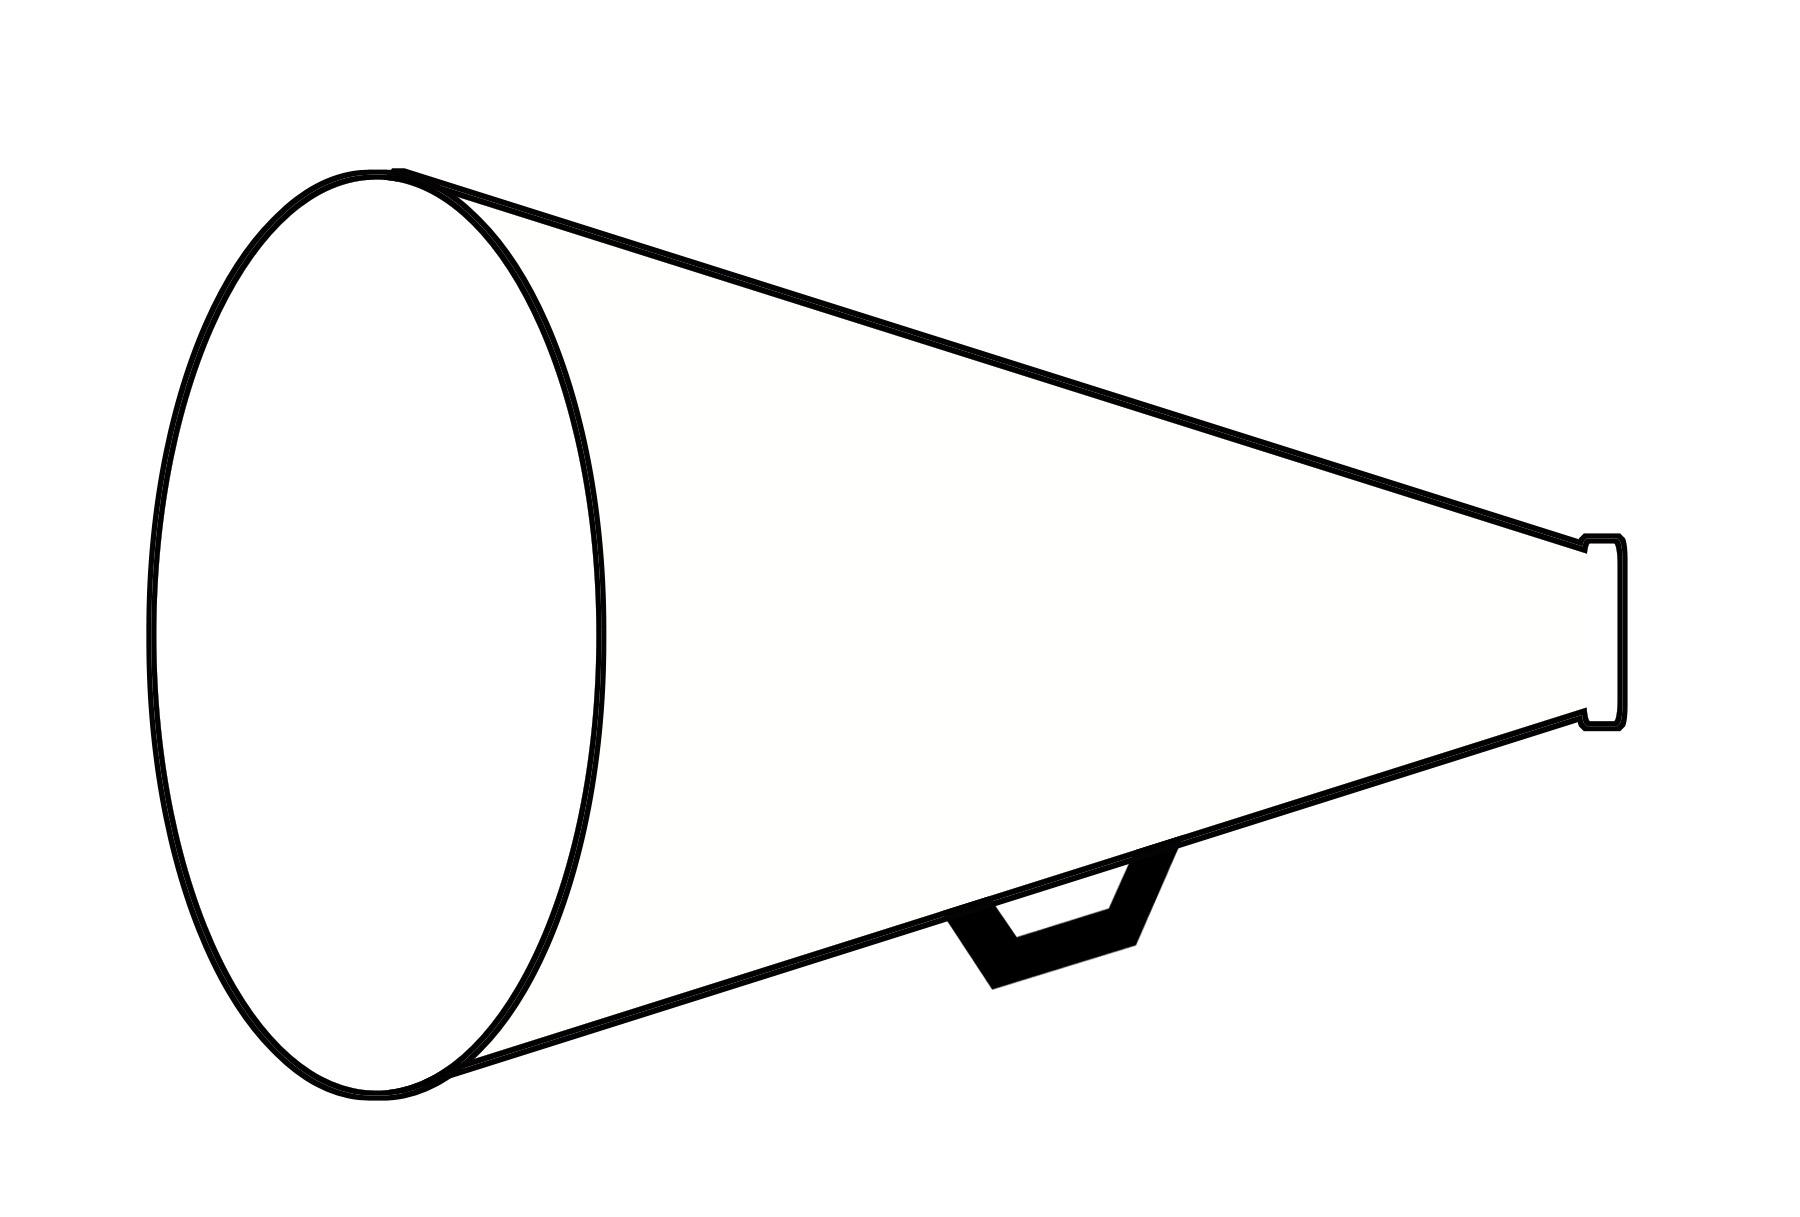 Image of cheerleader megaphone clipart 4 cheer megaphone clip